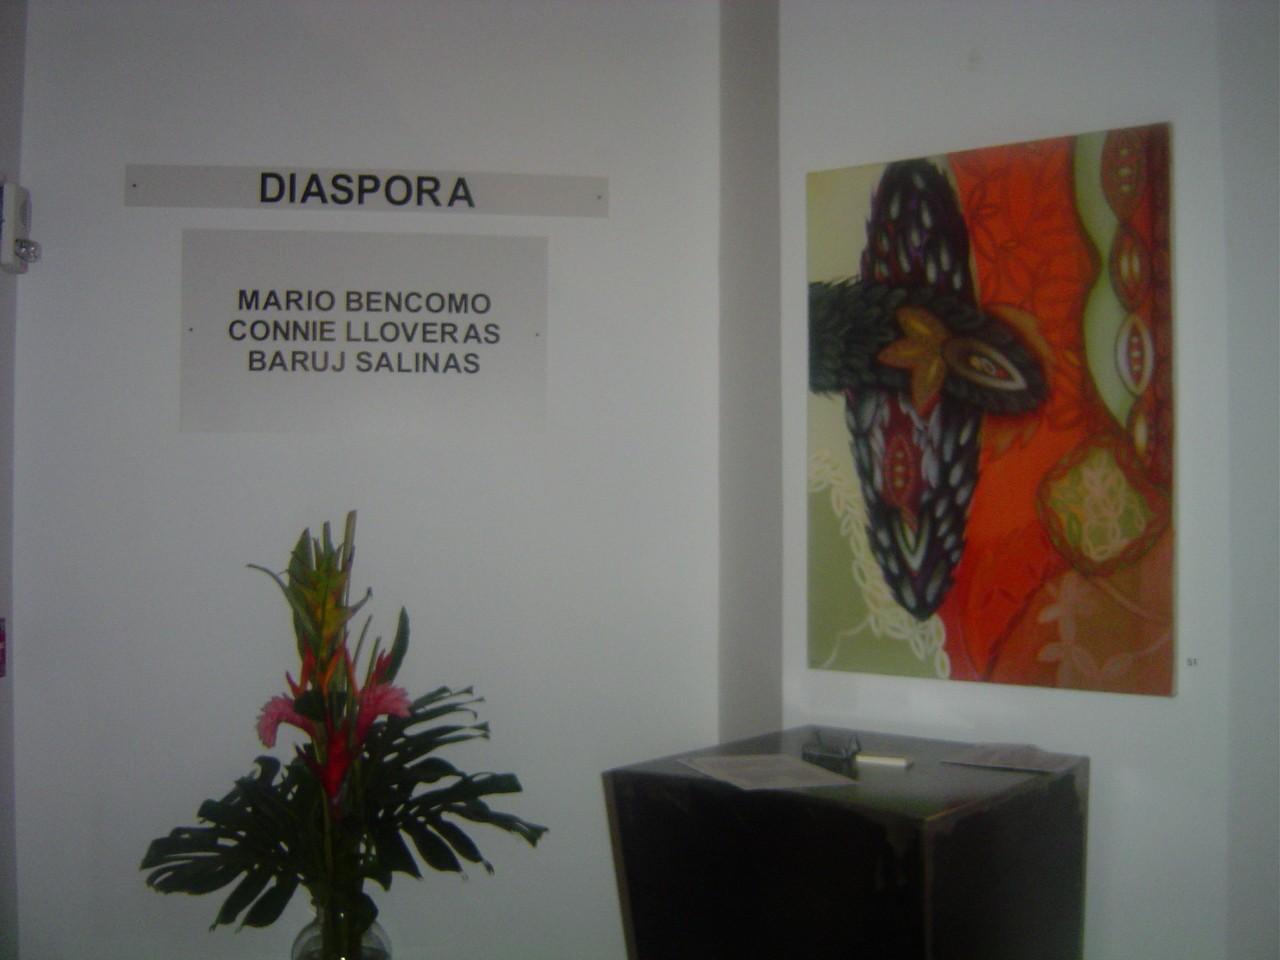 Diasporaentrance2.JPG